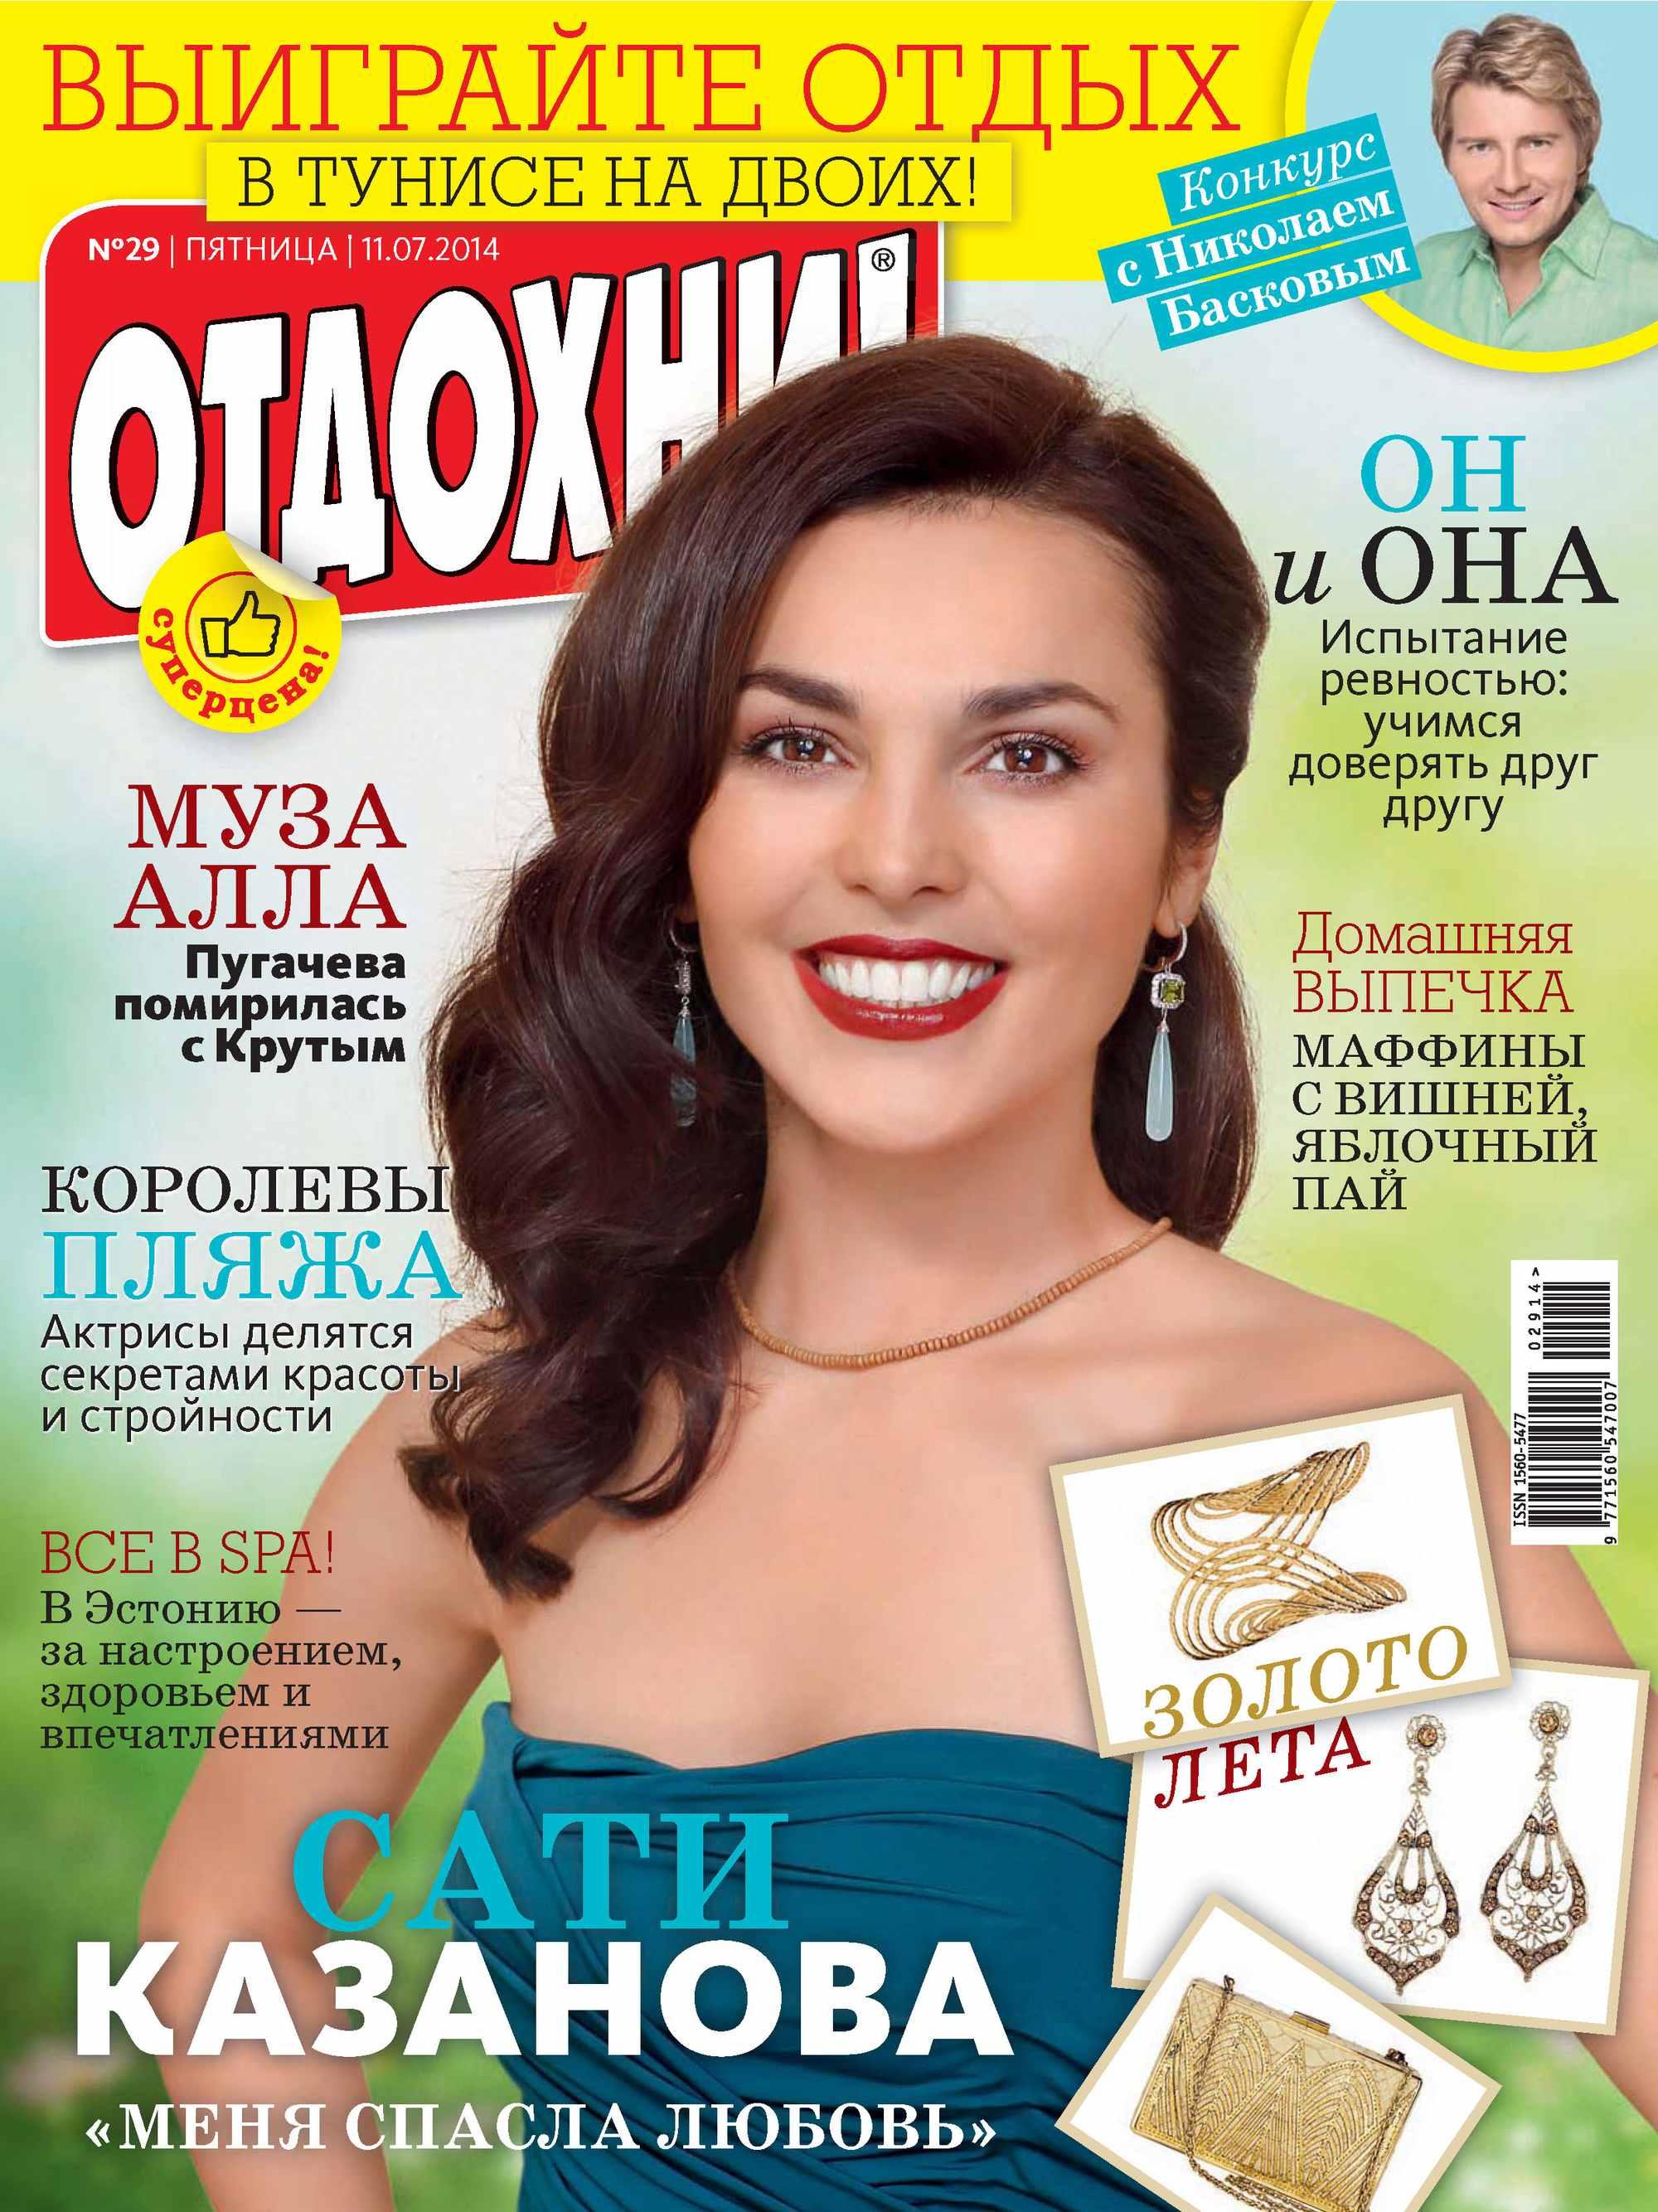 ИД «Бурда» Журнал «Отдохни!» №29/2014 цена